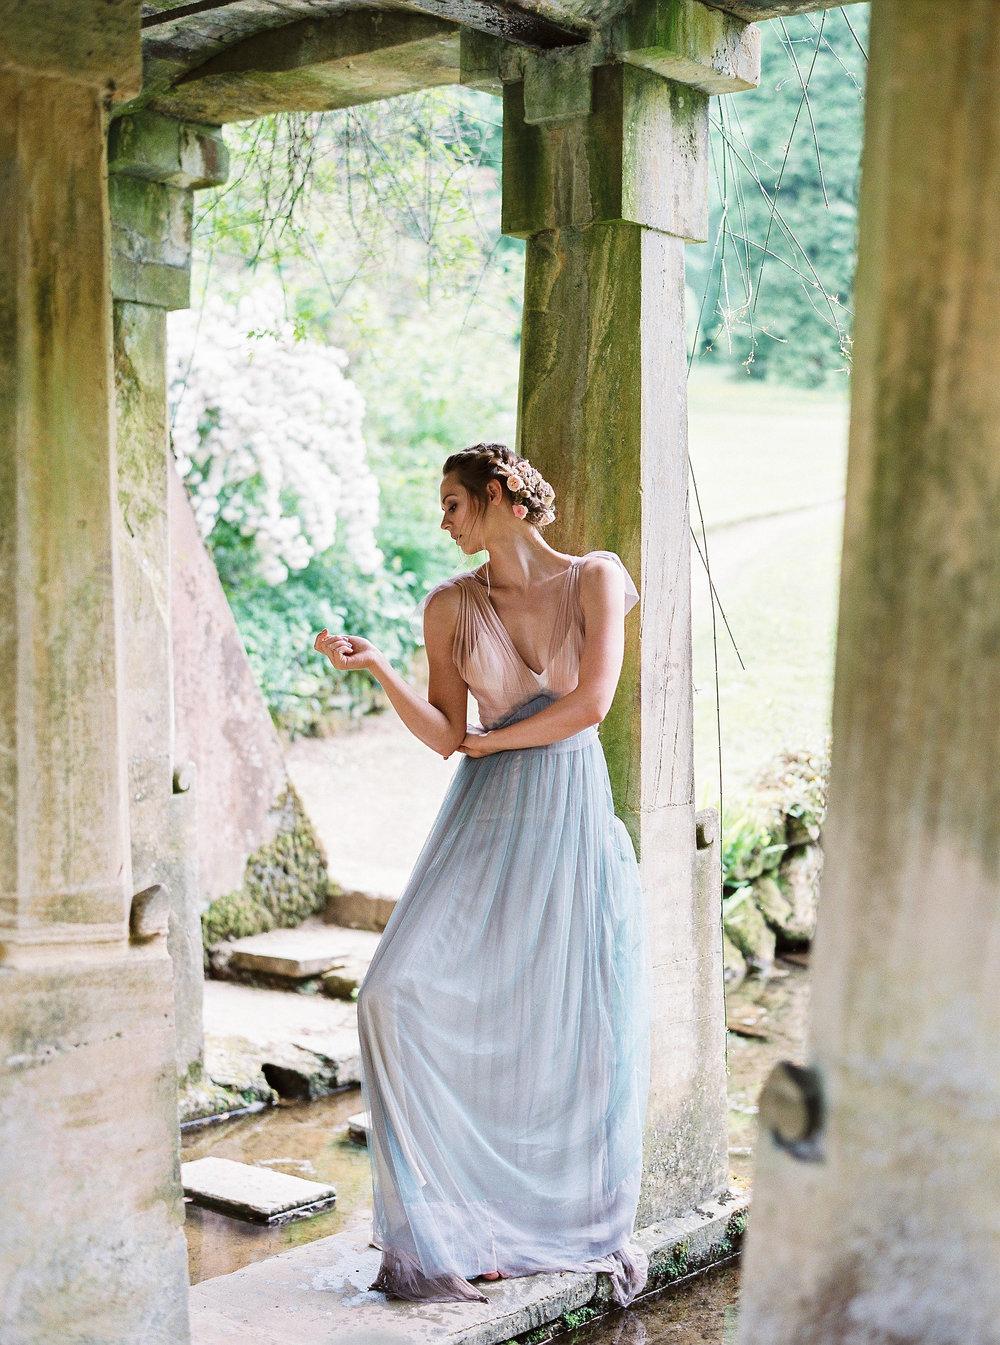 Lucy_Davenport_Photography_Sezincote-109.jpg